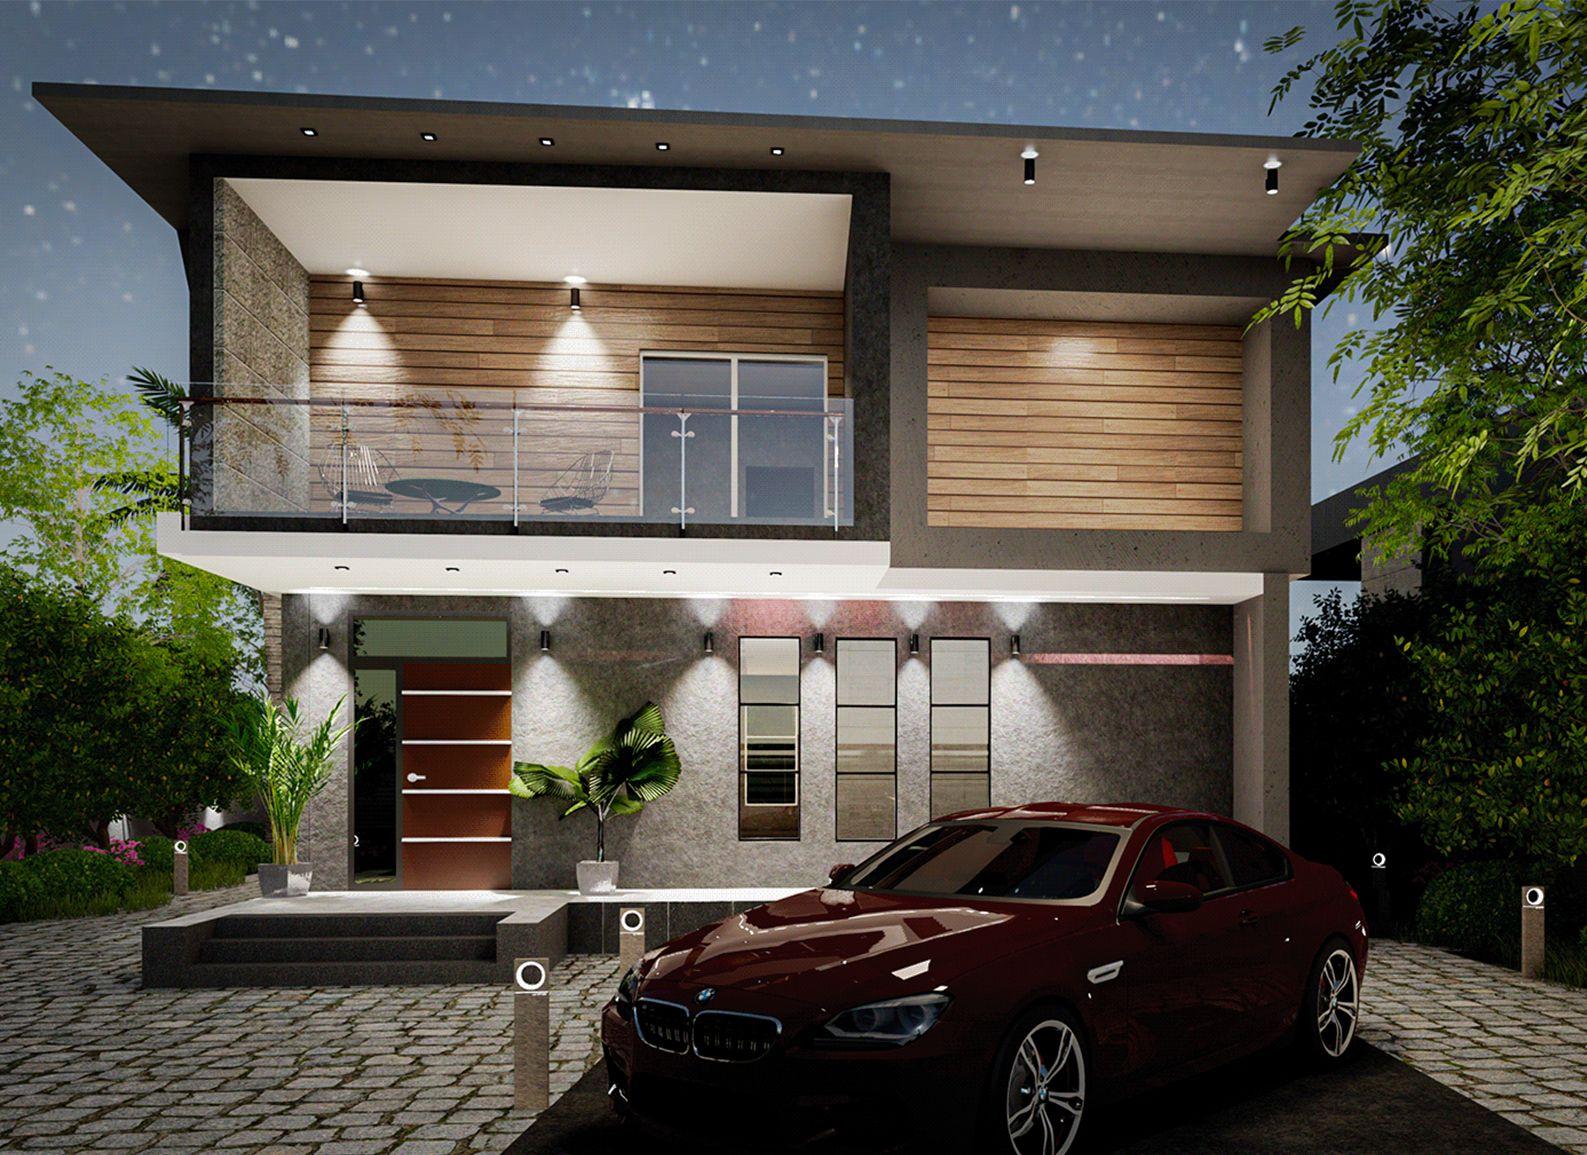 Modern Villa - Night Exterior Modeling and Visualization ( SketchUp + D5 Render )